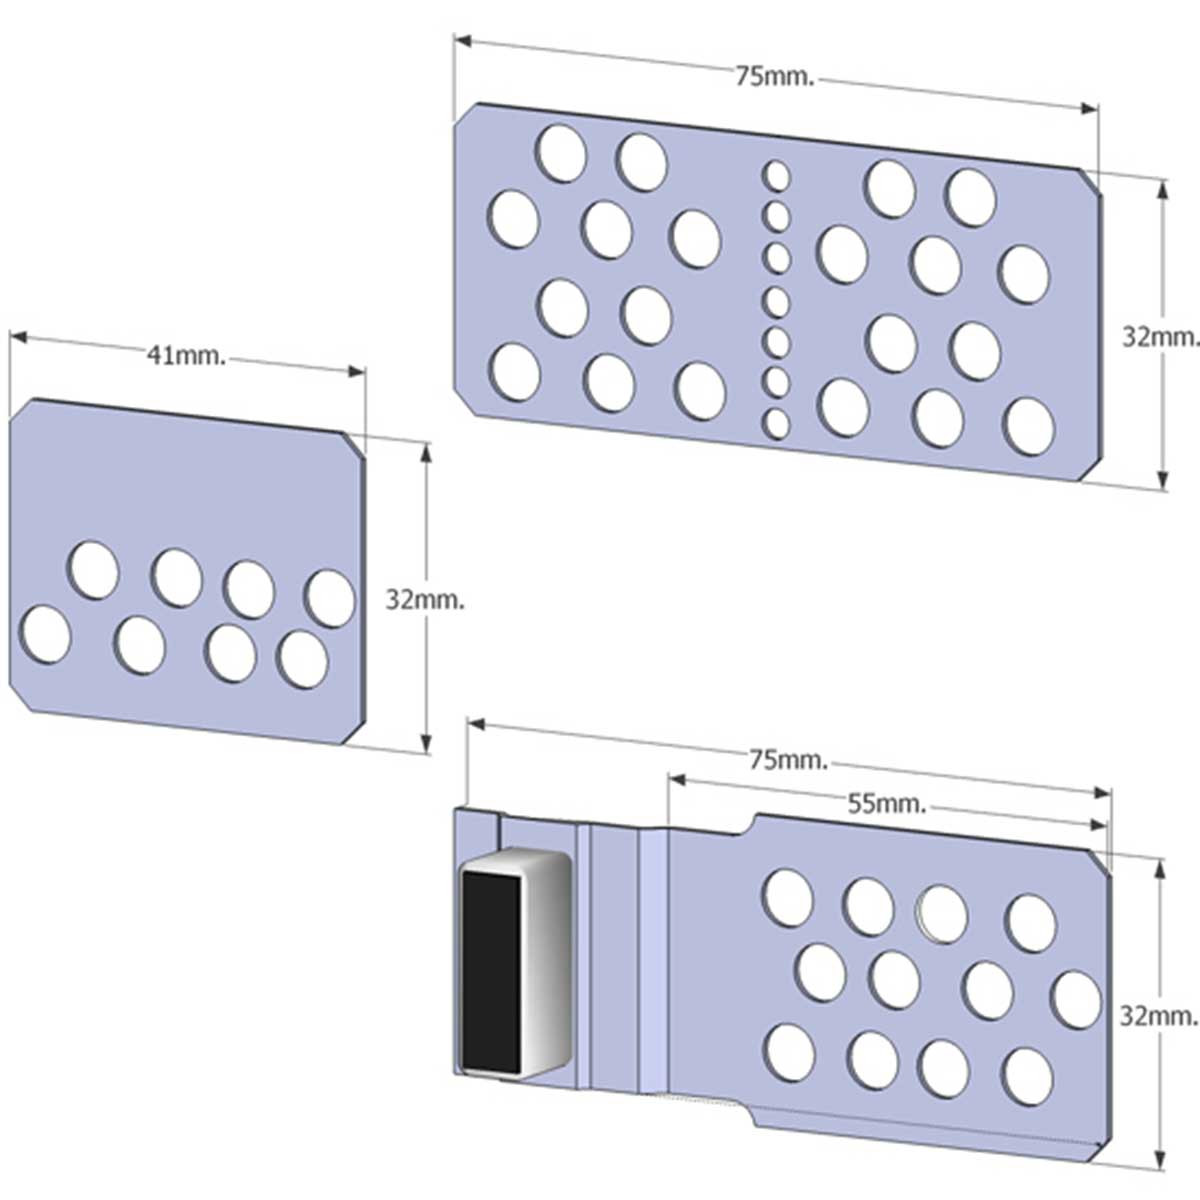 T3800400 Tomecanic Magnetic Tile Access Panel 4pcs